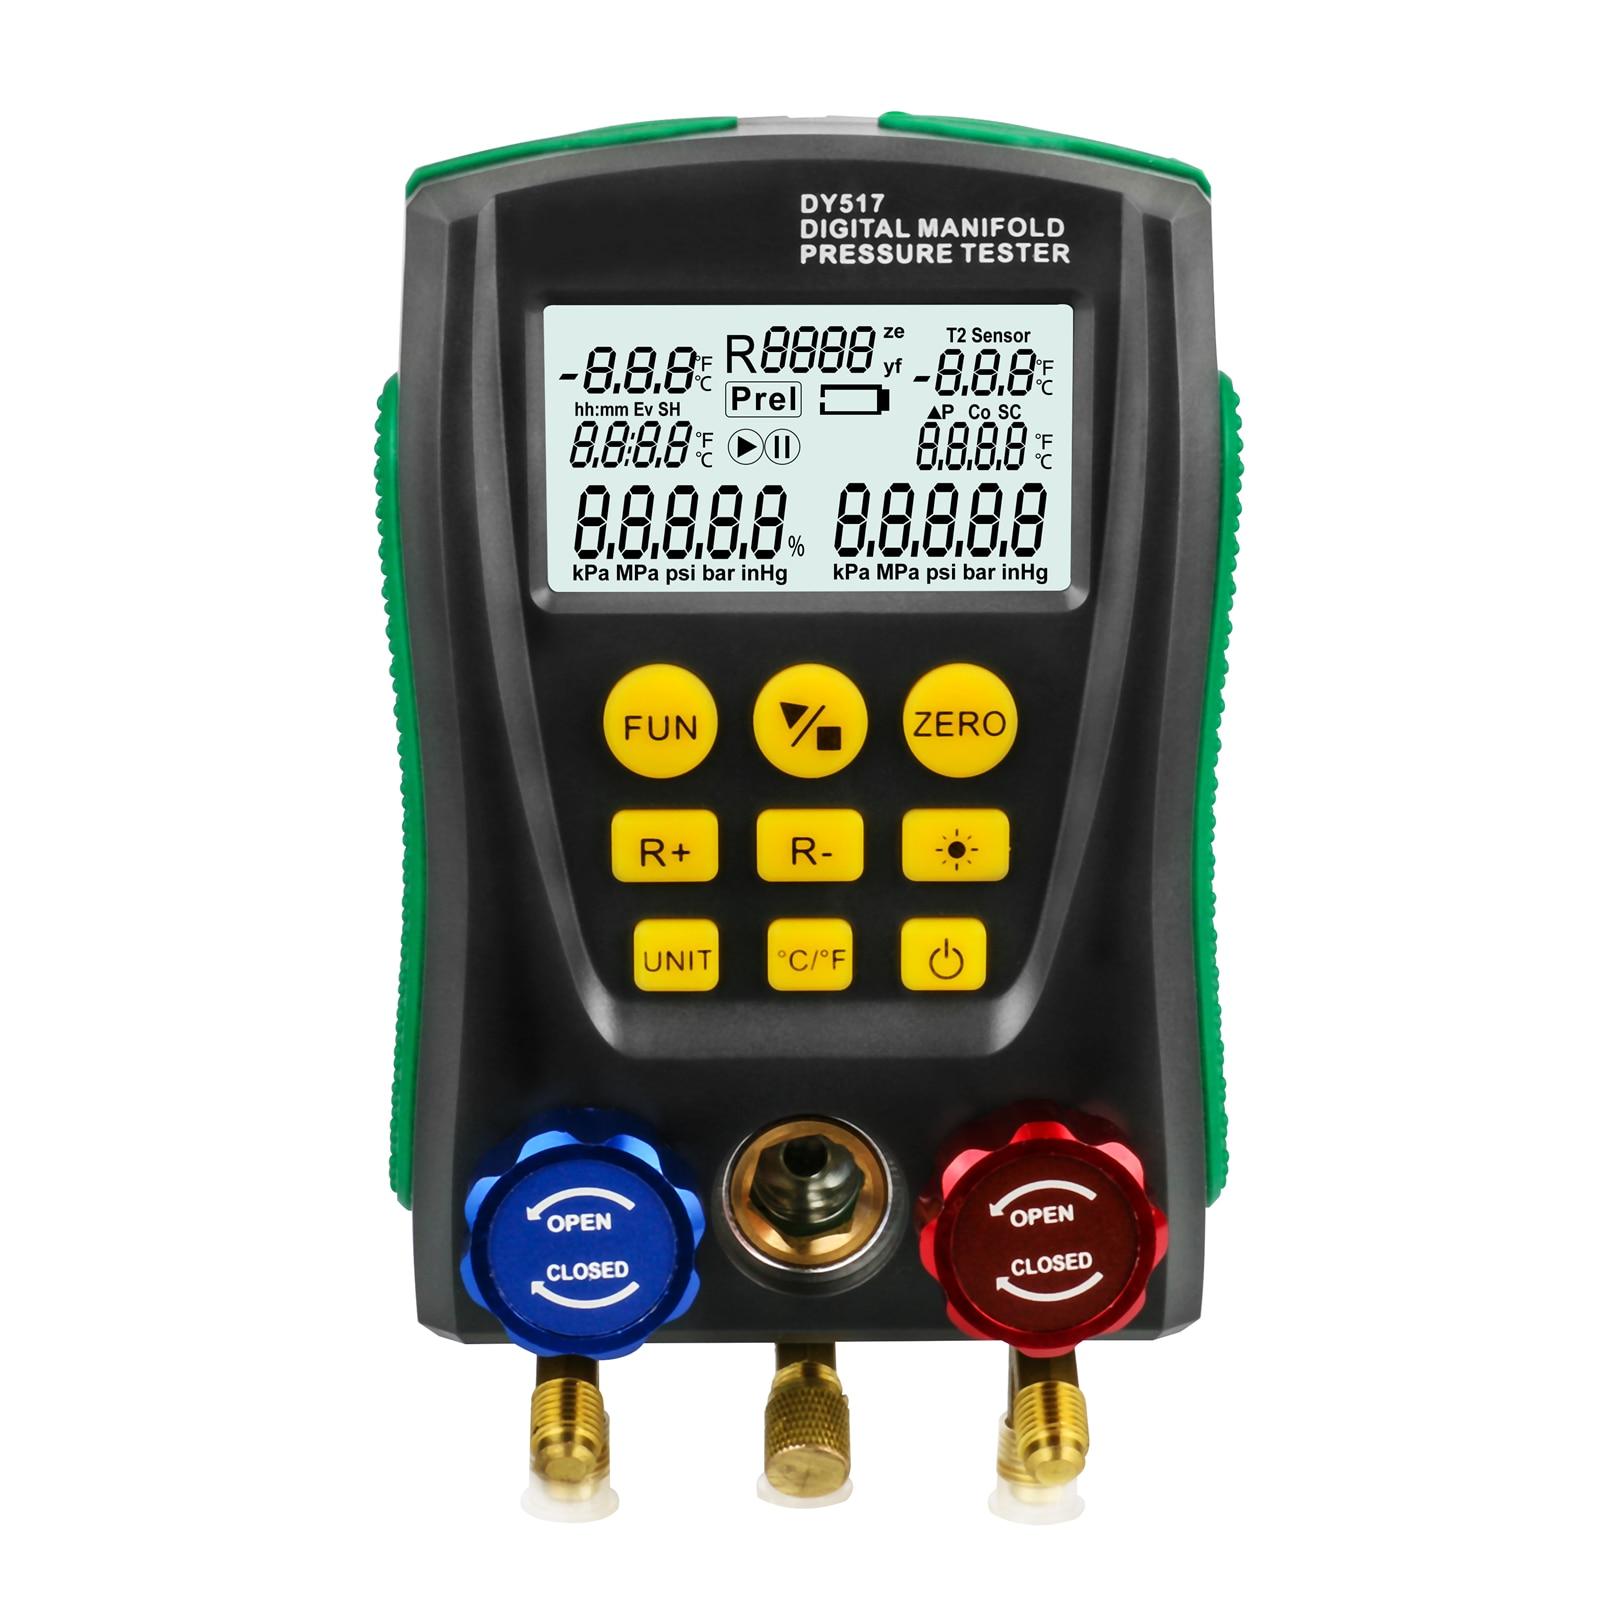 Refrigeration Tools Digital Manifold Gauge Meter HVAC Vacuum Pressure Temperature Tester Leakage Test